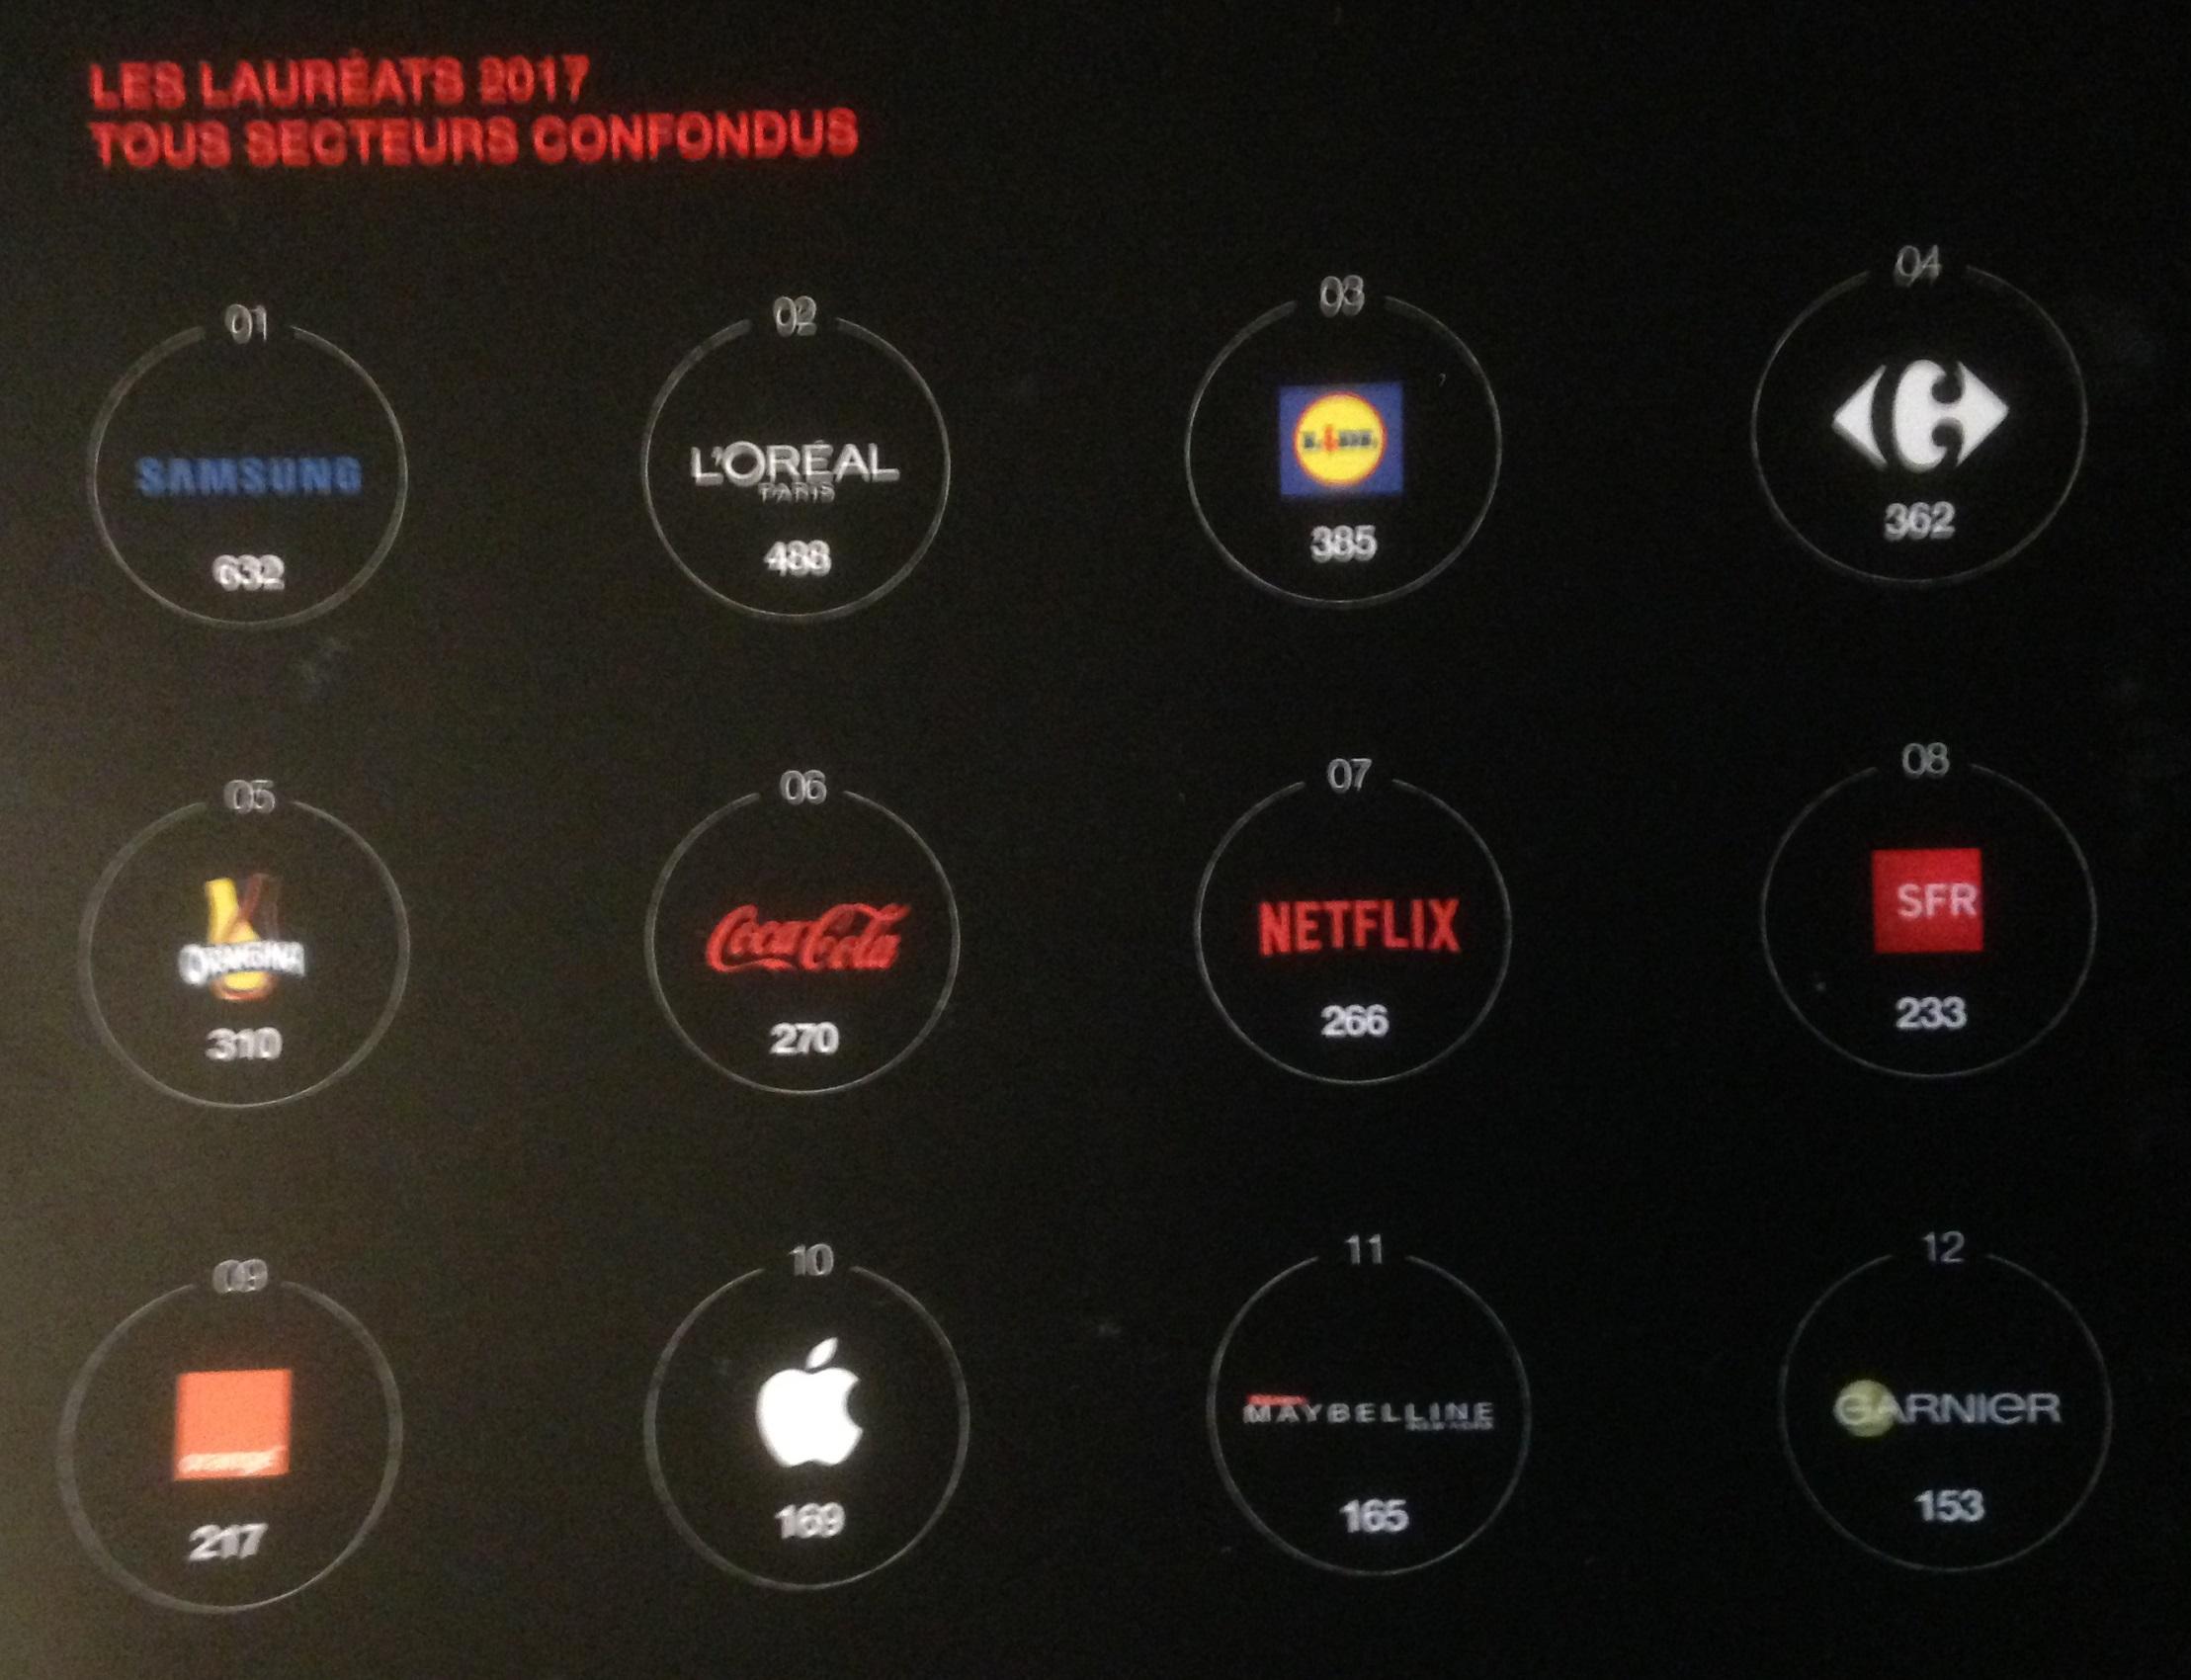 Index de l'attractivité digitale, classement des marques